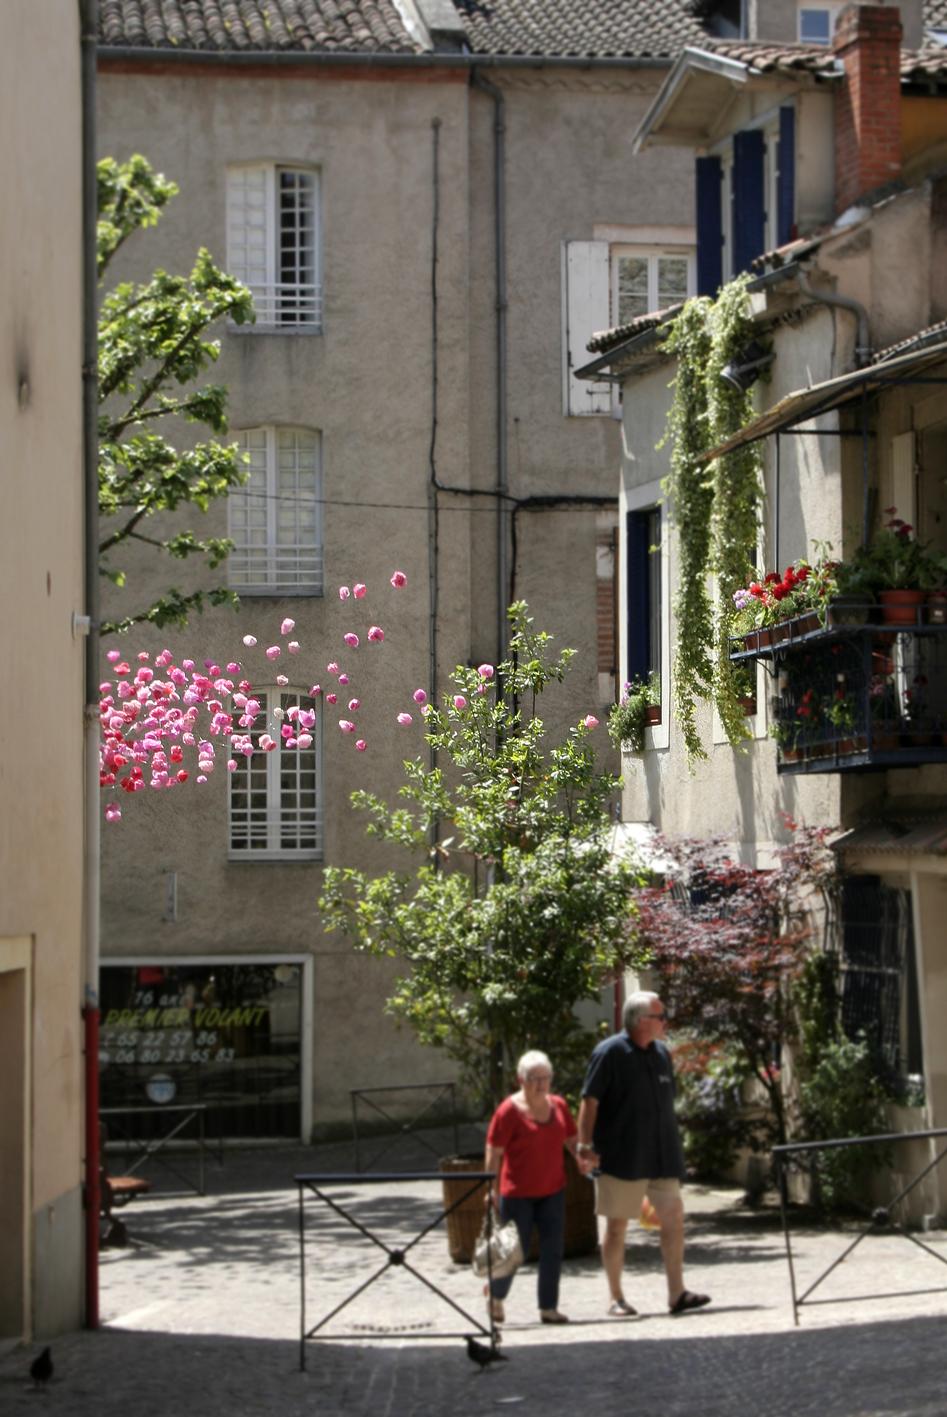 Marie h l ne richard rosae plasticae cahors juin jardin 2012 for Cahors jardin juin 2015